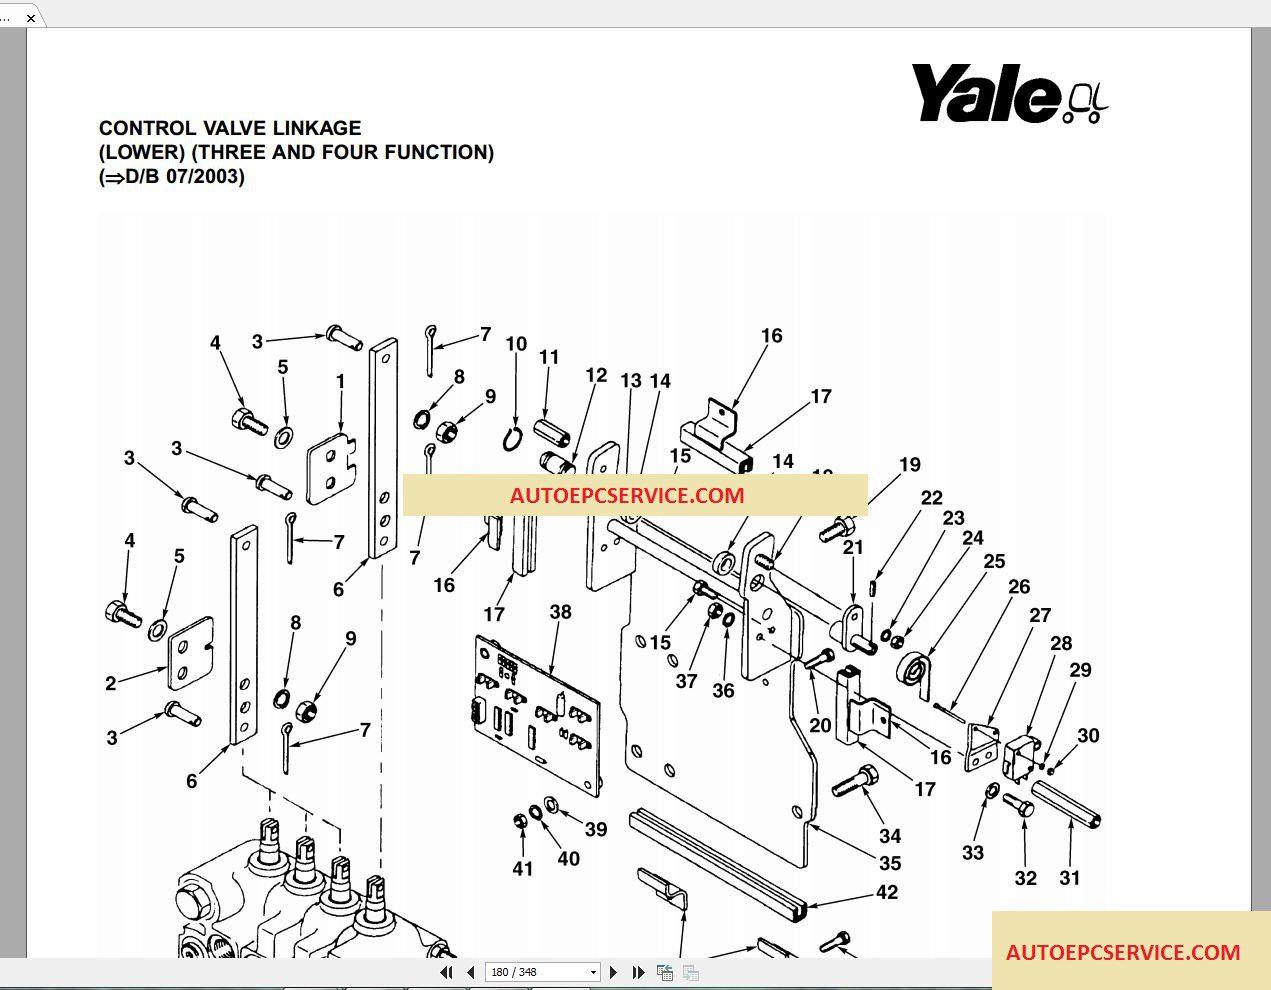 Yale Forklift Spare Parts Full Set